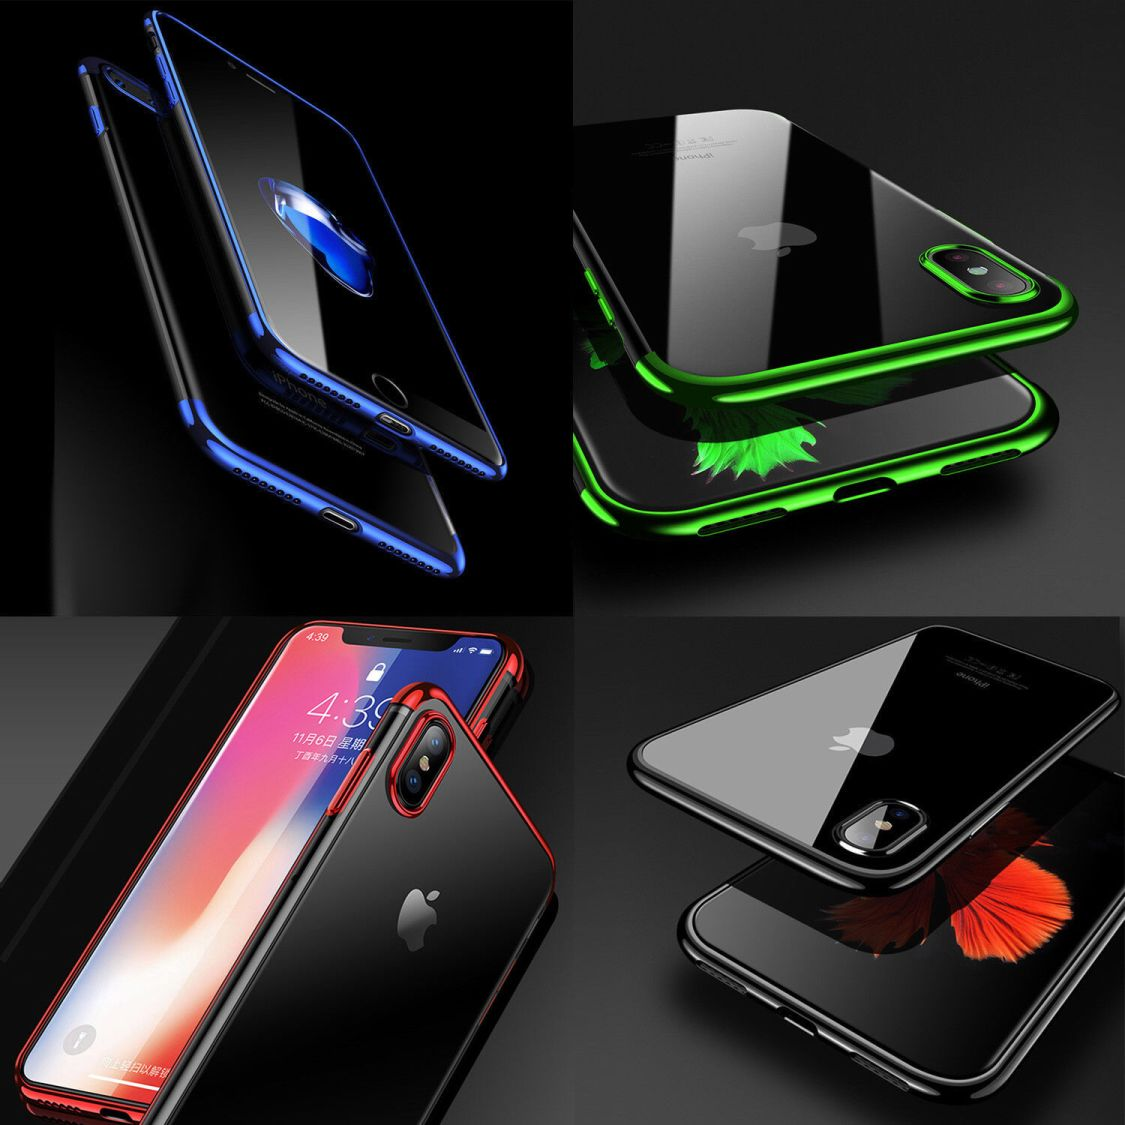 Hülle für iPhone 7 / 8 Ultra Slim Silikon Hülle Transparent Case + Schutz Glas